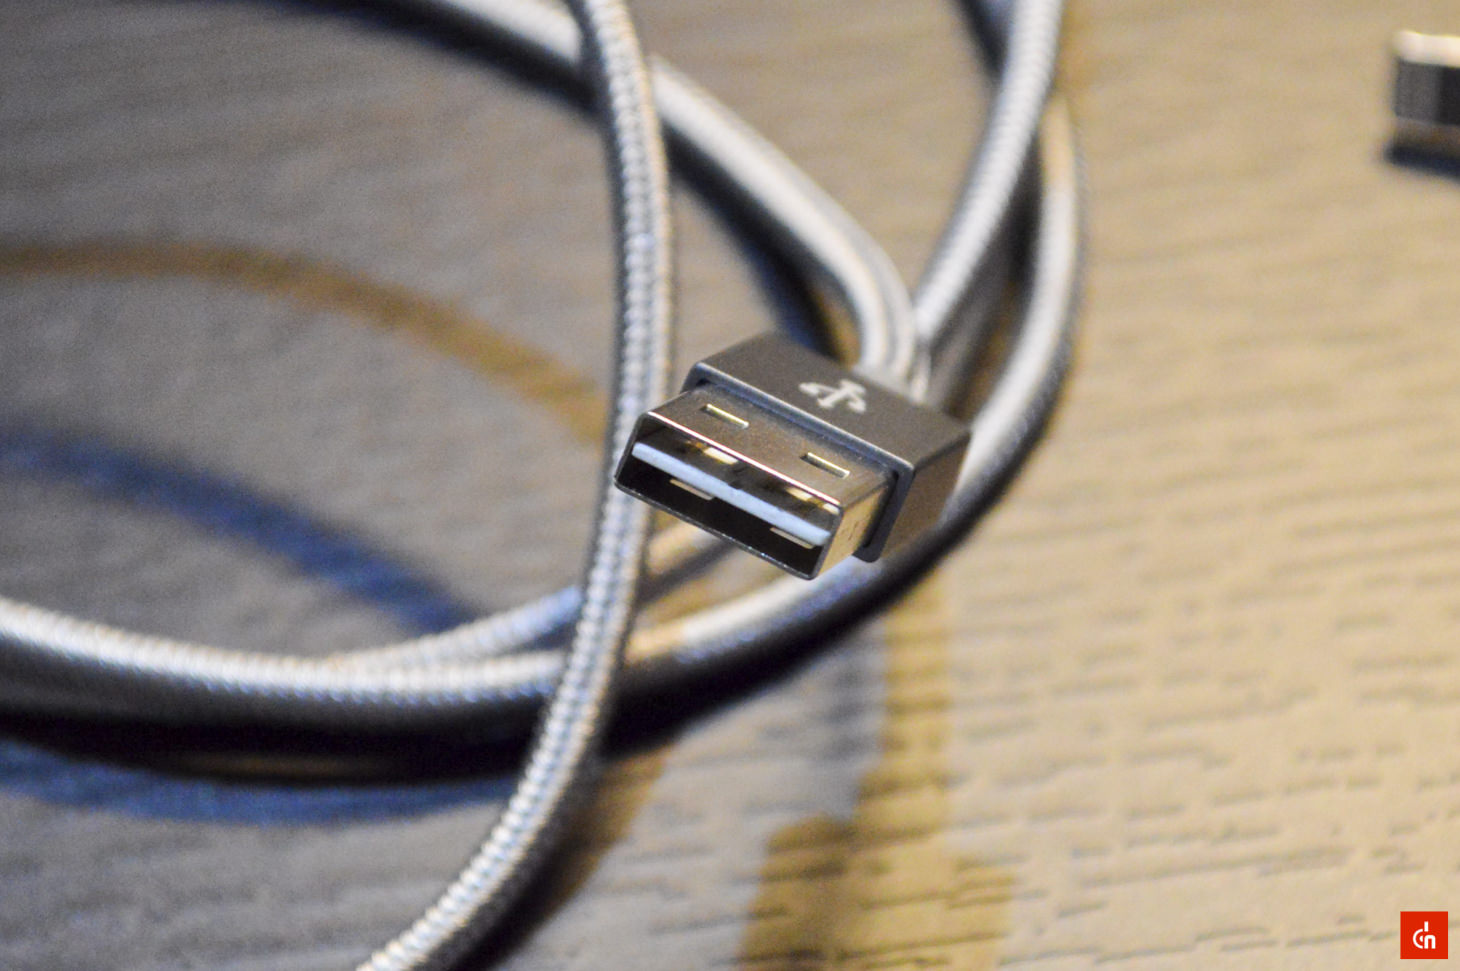 008_20160605_Lightning-cable-omaker